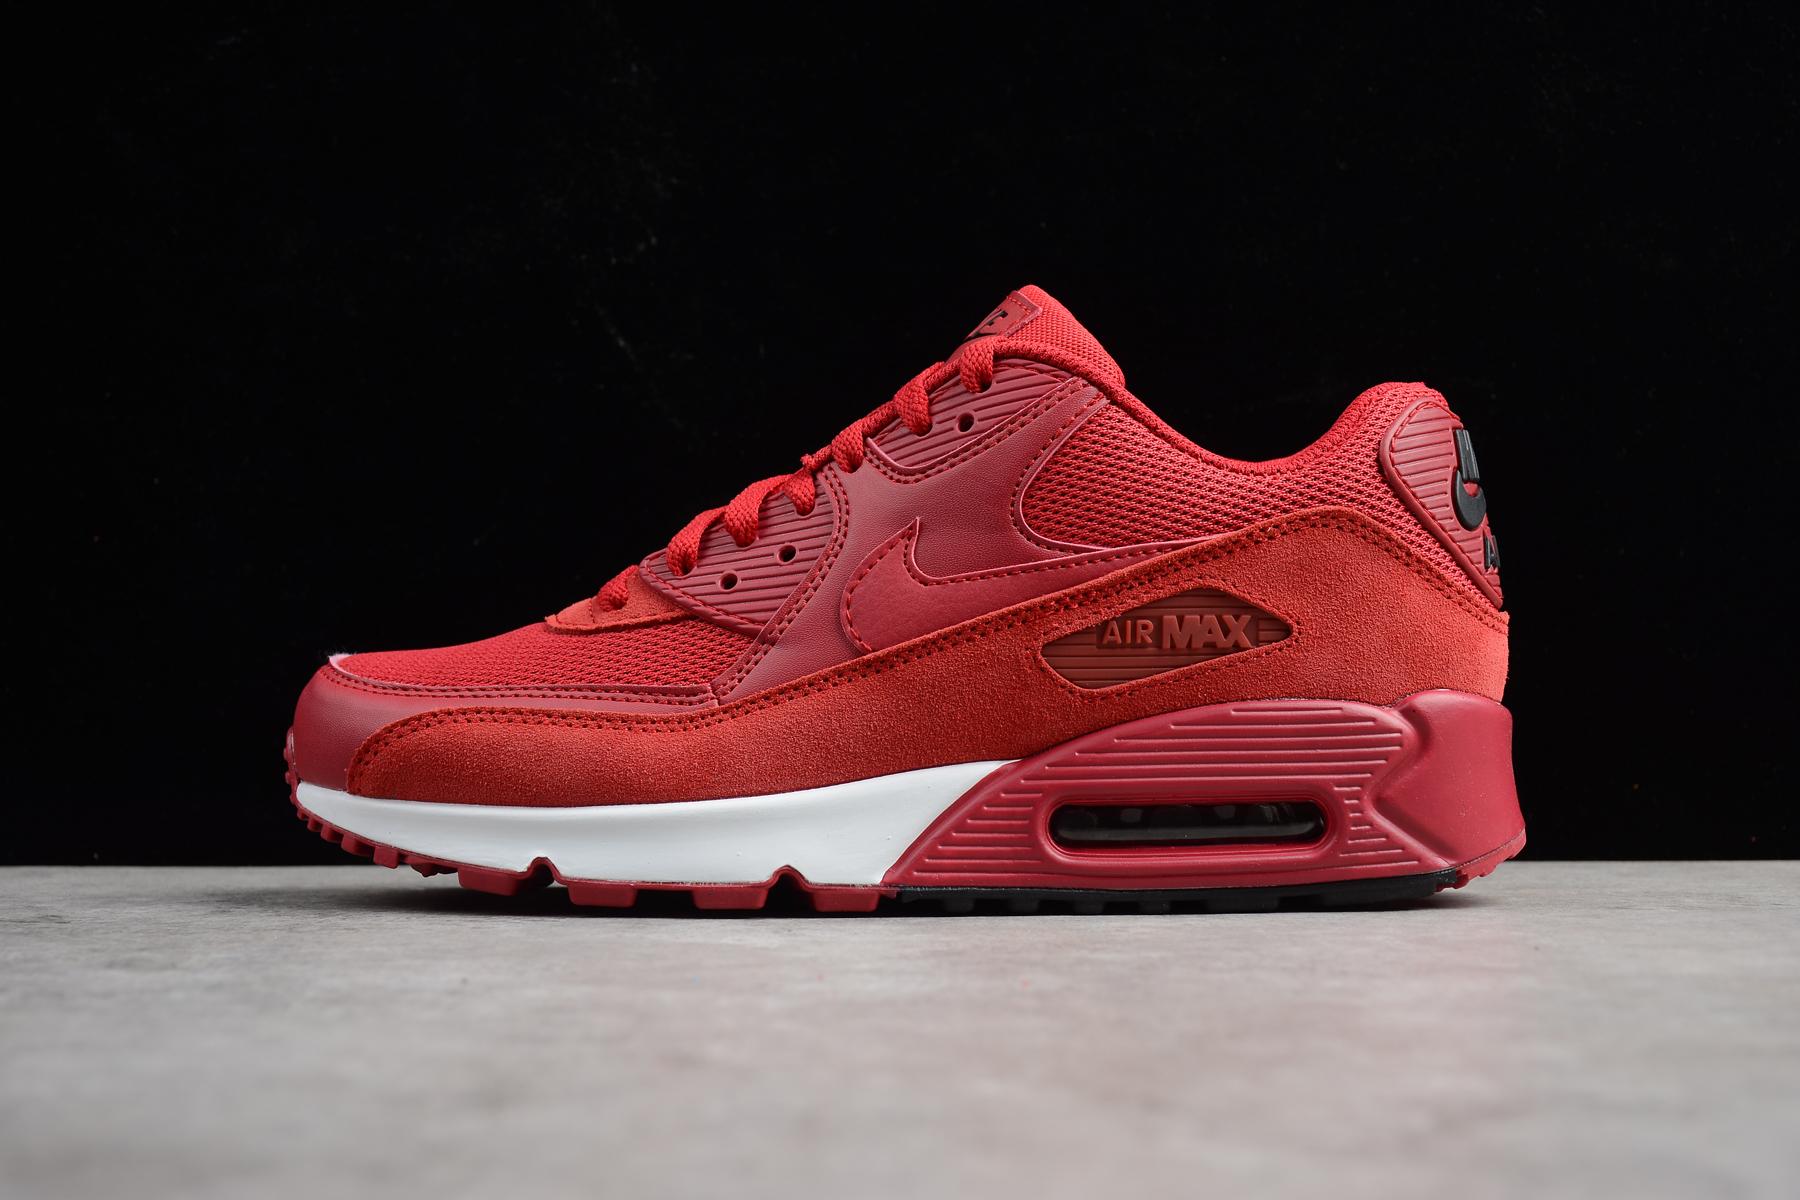 Nike Air Max 90 Essential Gym Red/Black-White 537384-604 Men's Shoes